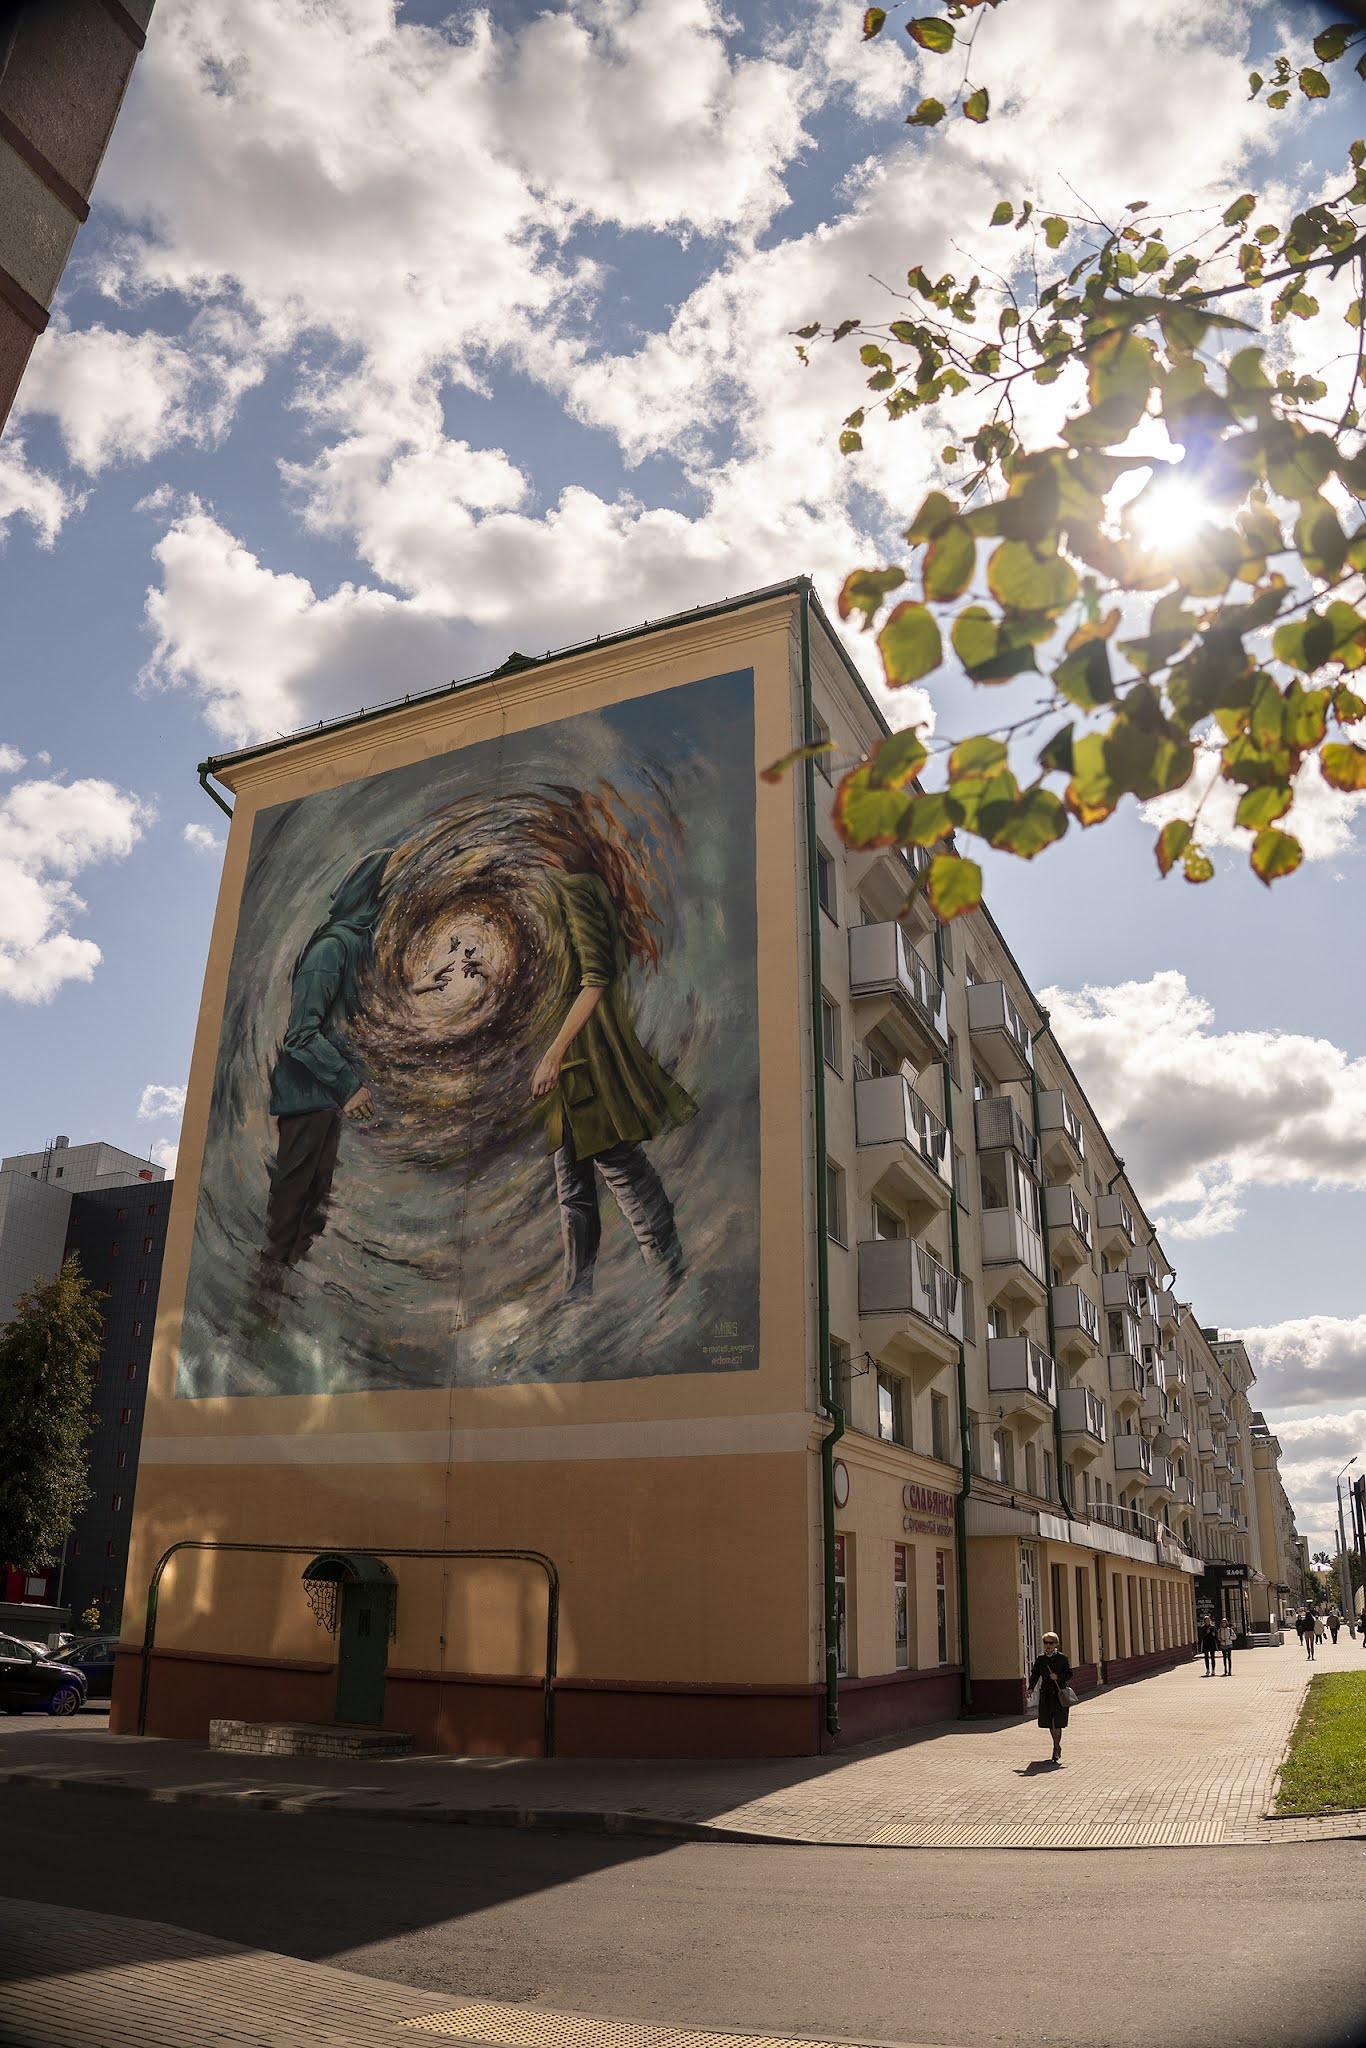 Mogilev graffiti drawing street art Belarus